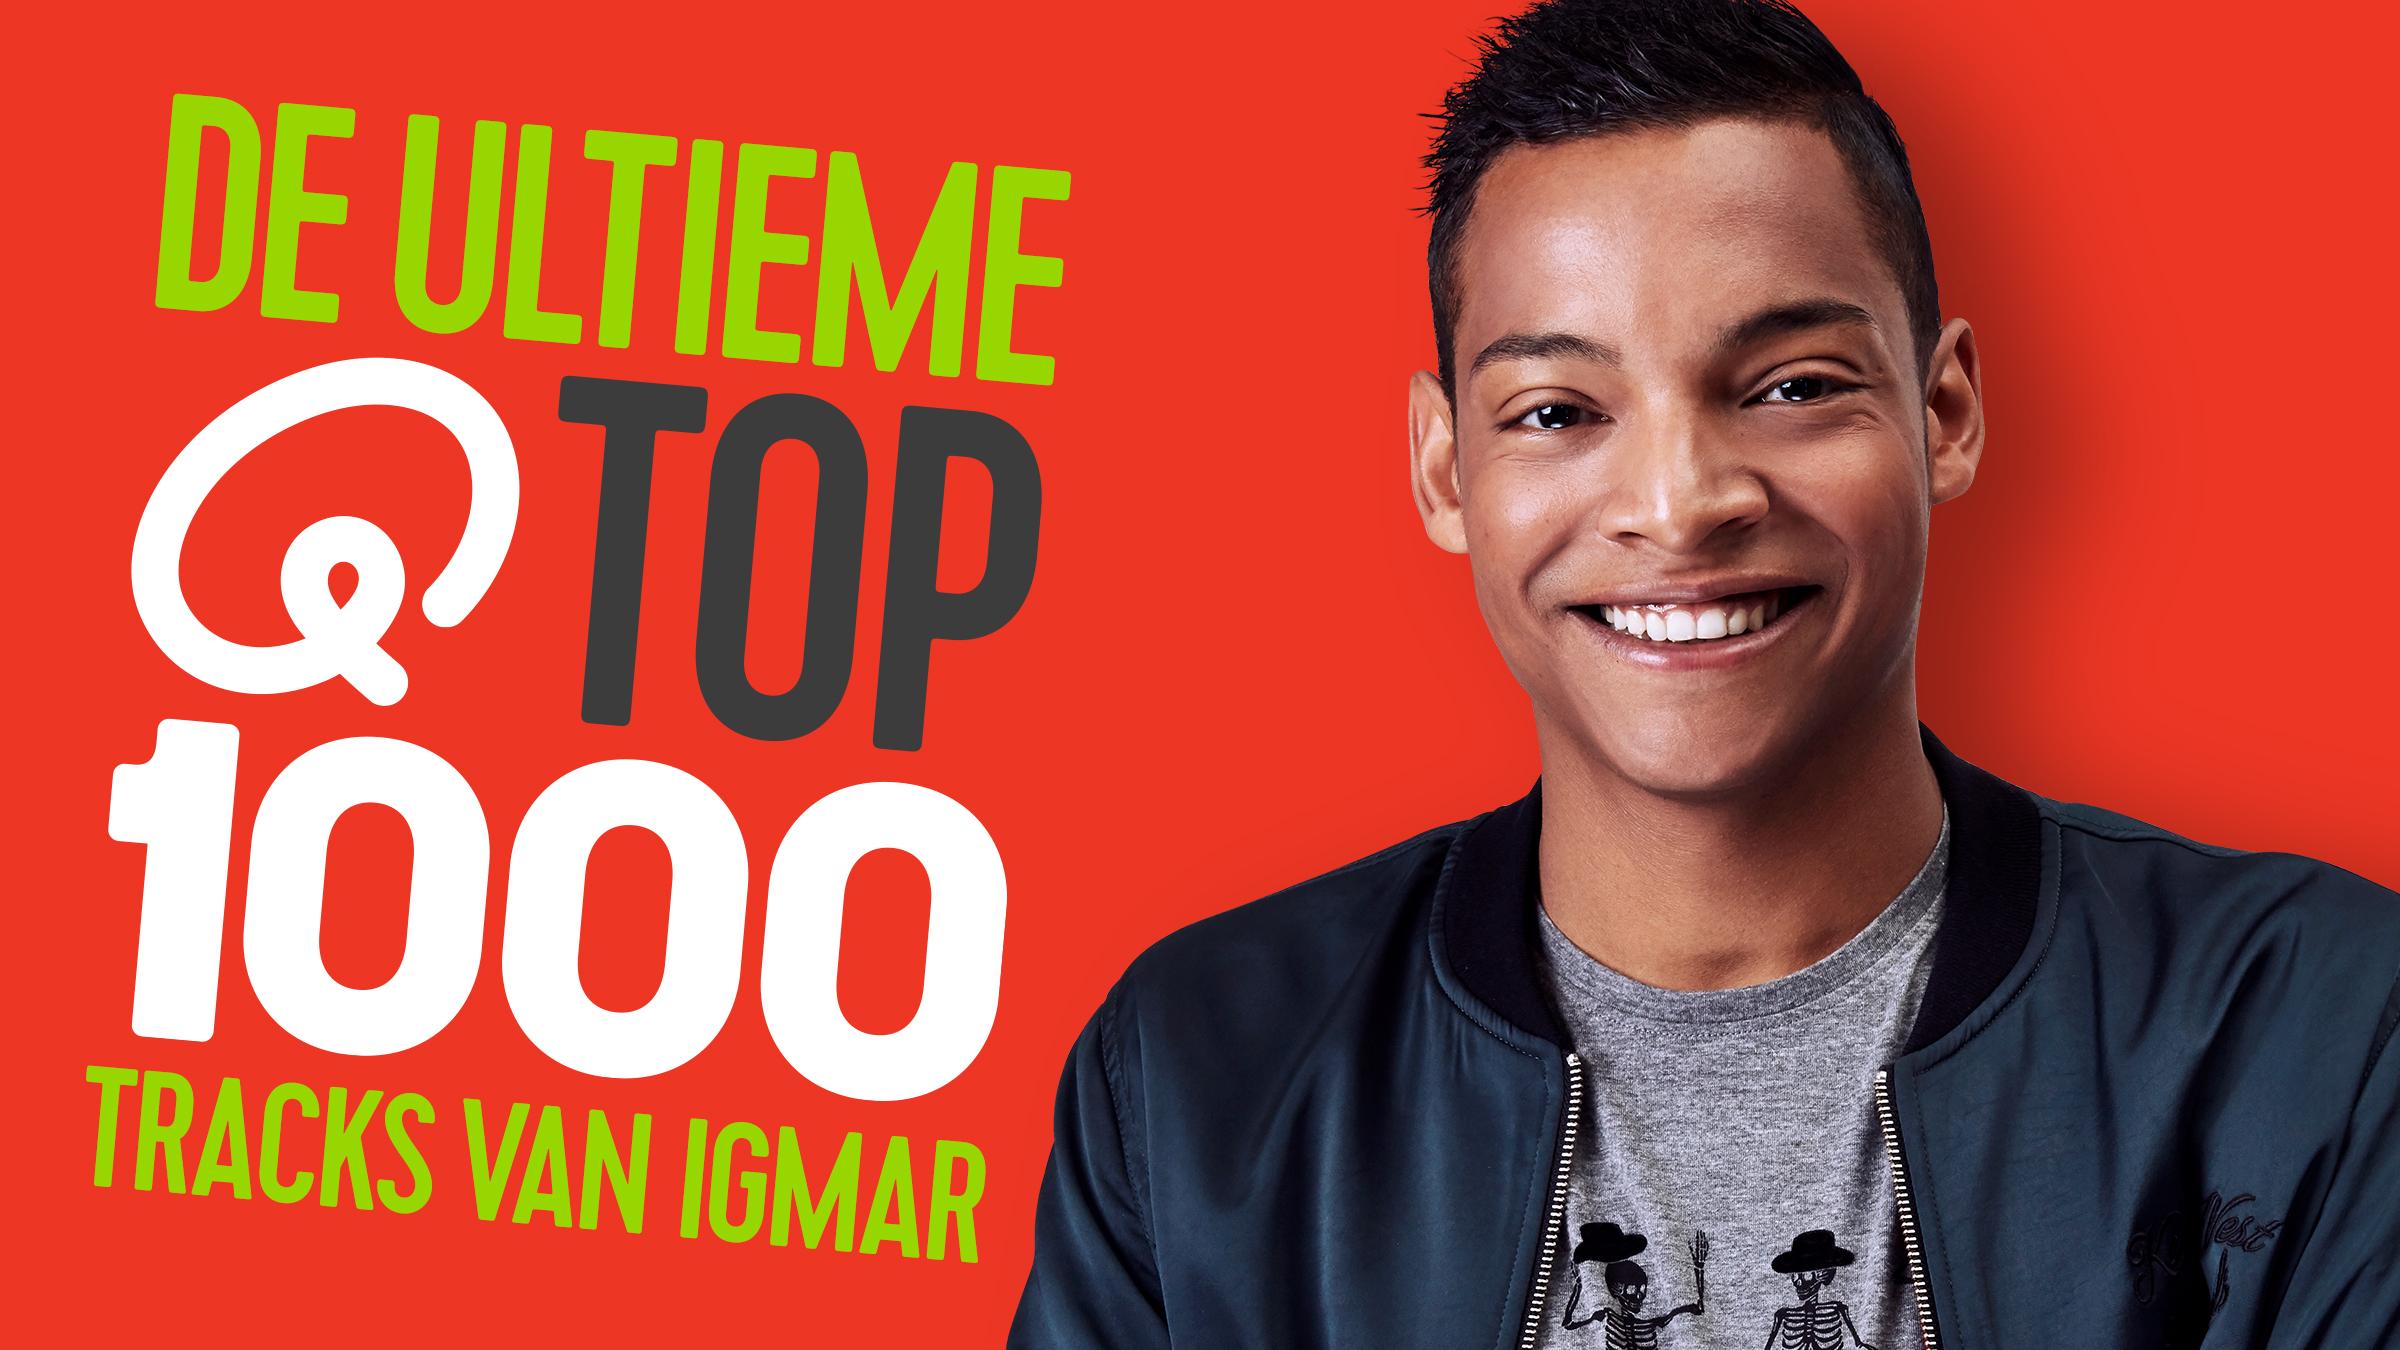 Qmusic teaser qtop1000 dj igmar